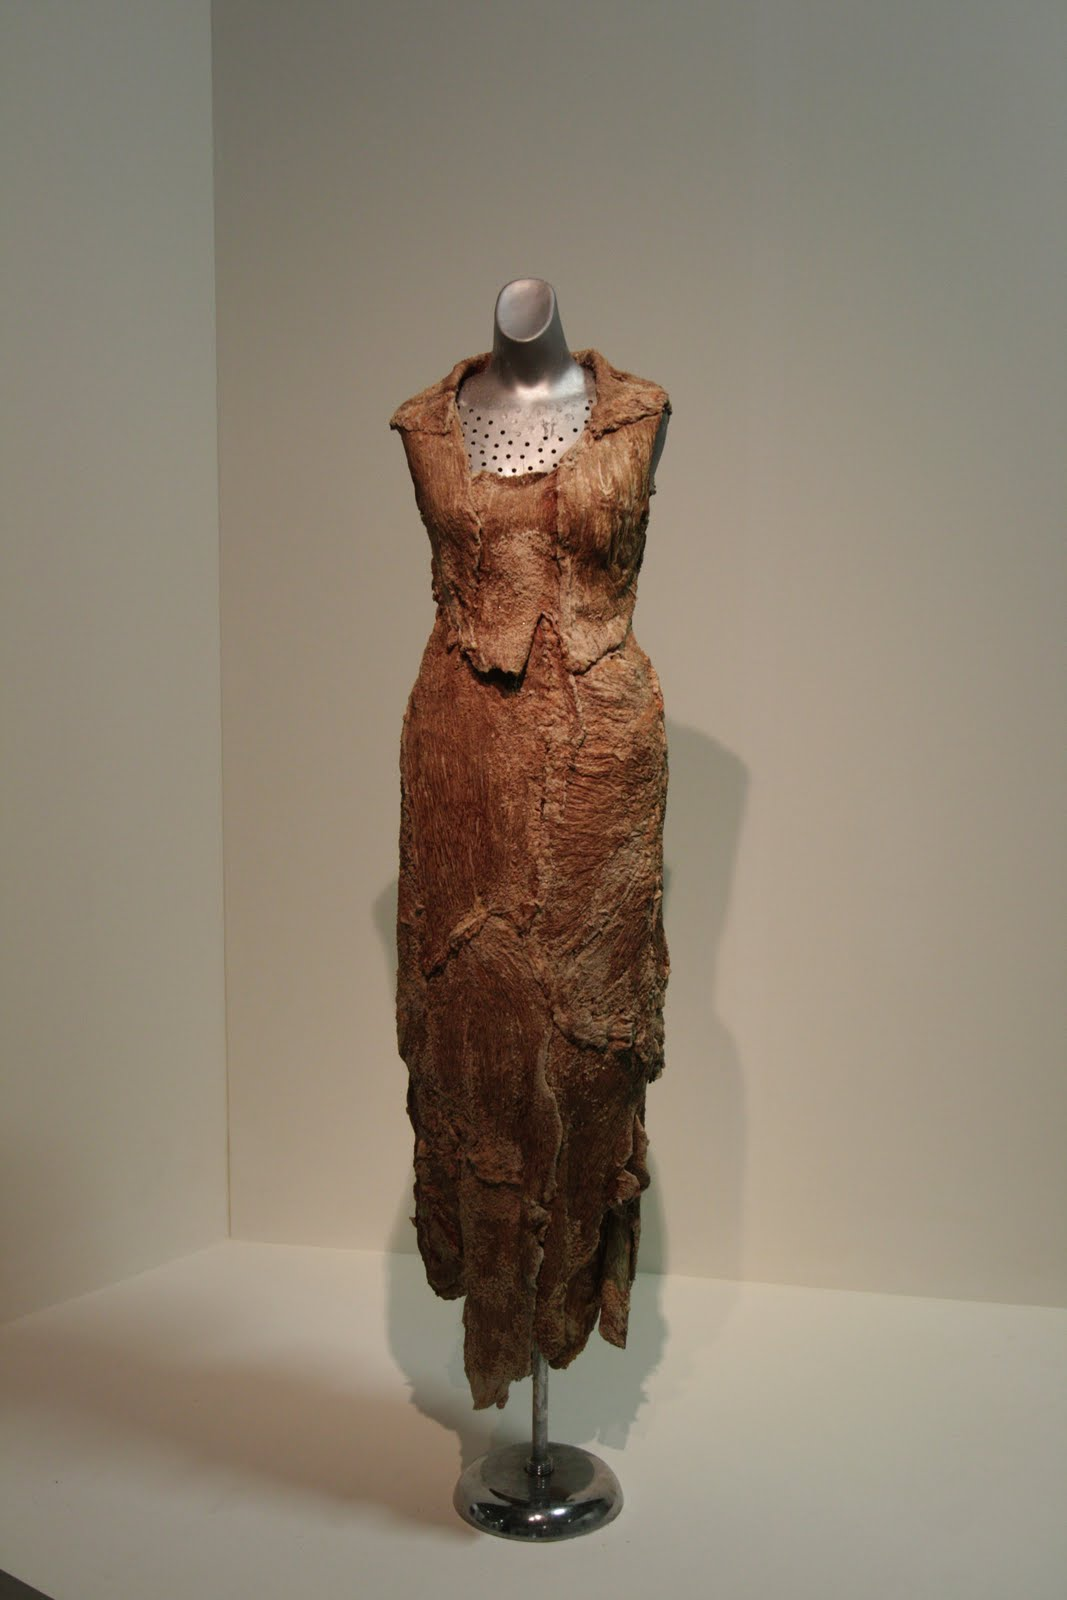 Vanitas - Flesh Dress For An Albino Anorectic (1987)